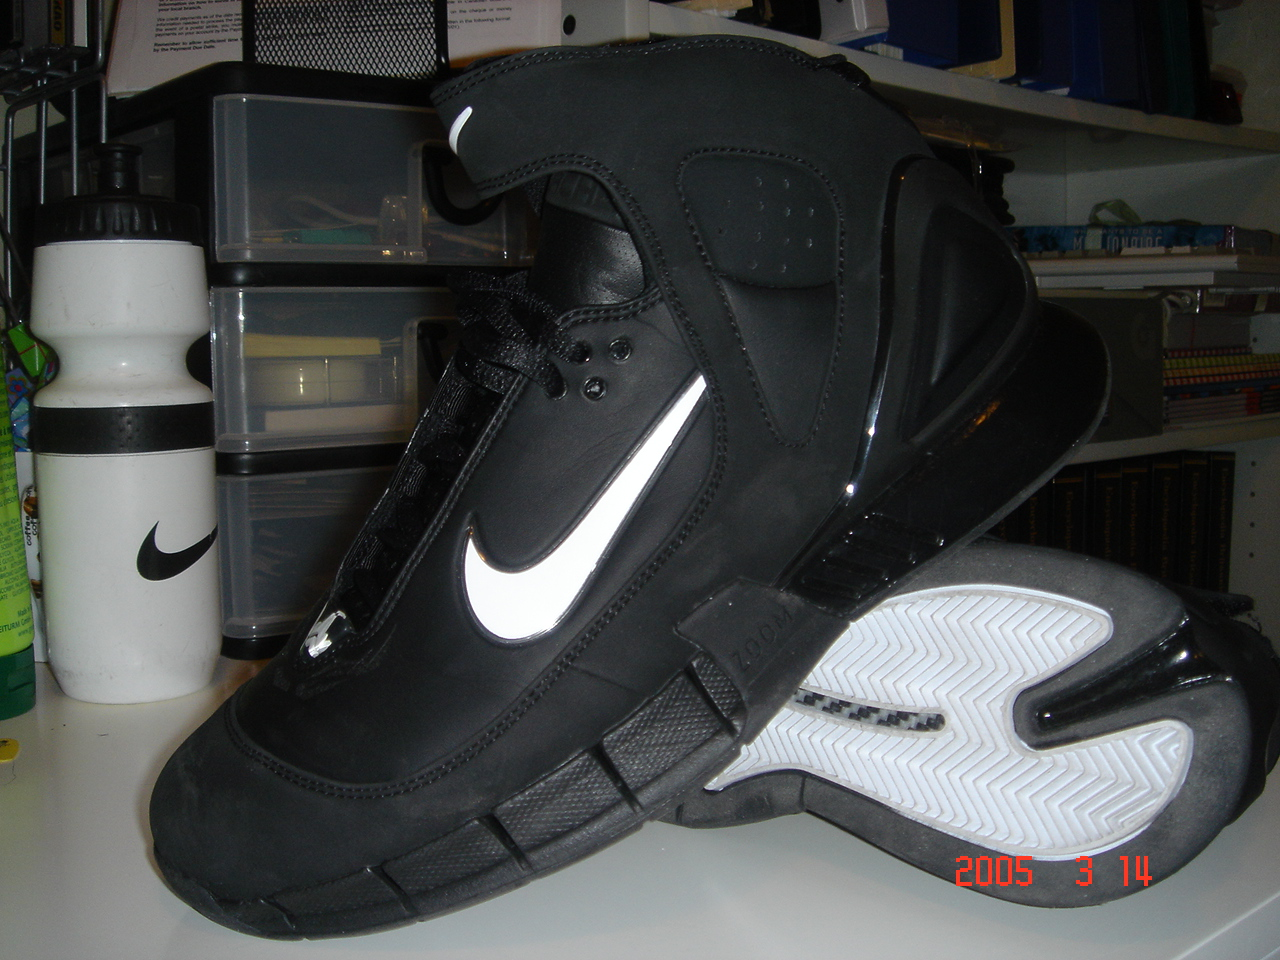 eeffb65e1a9 Footwear Science..  - Droppin  science like I drop dimes